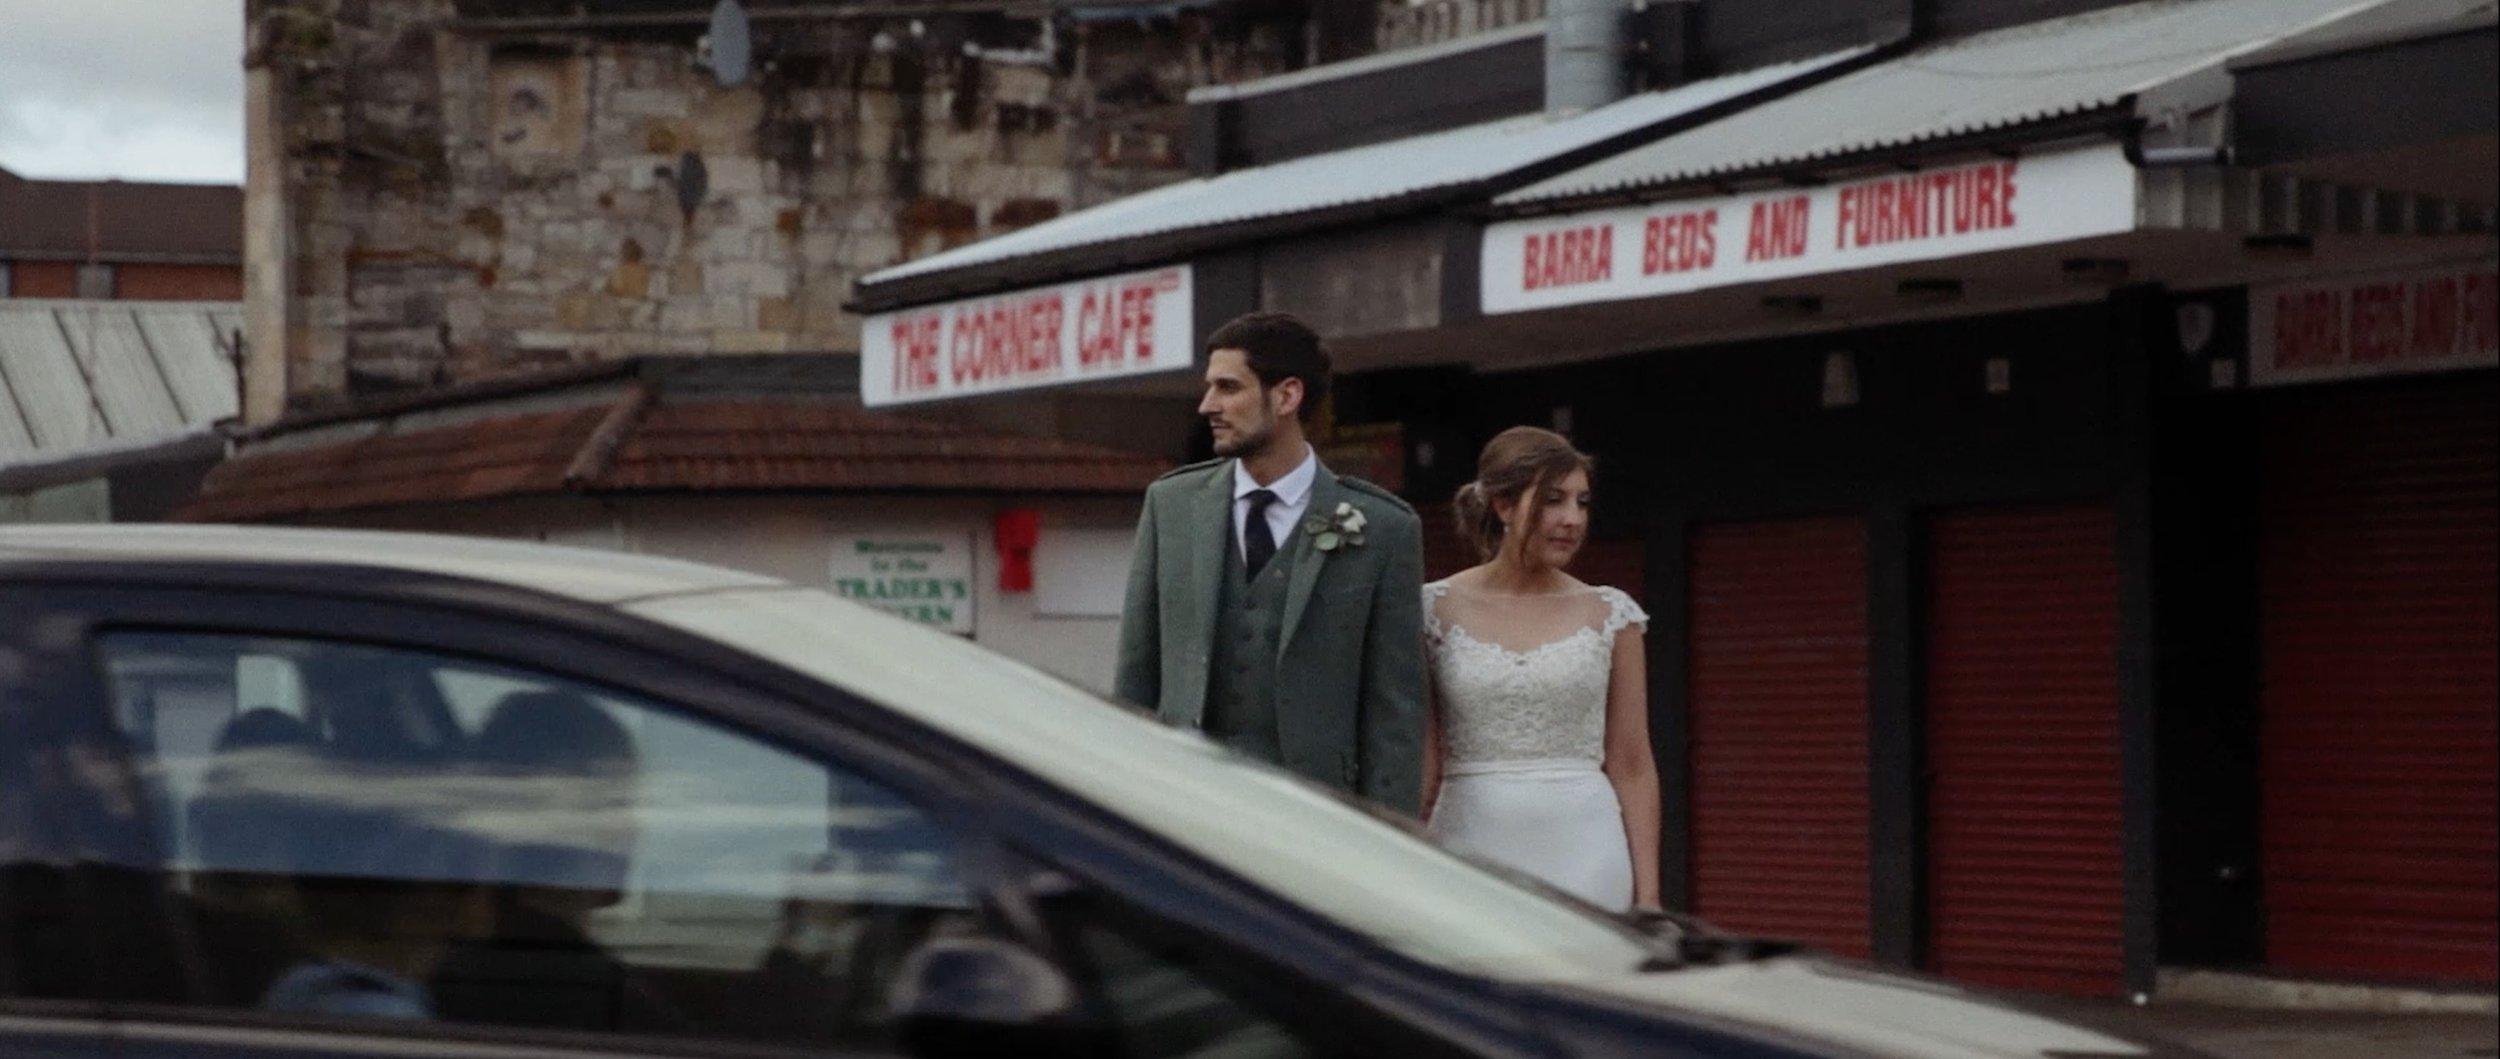 perth-wedding-videographer_LL_05.jpg